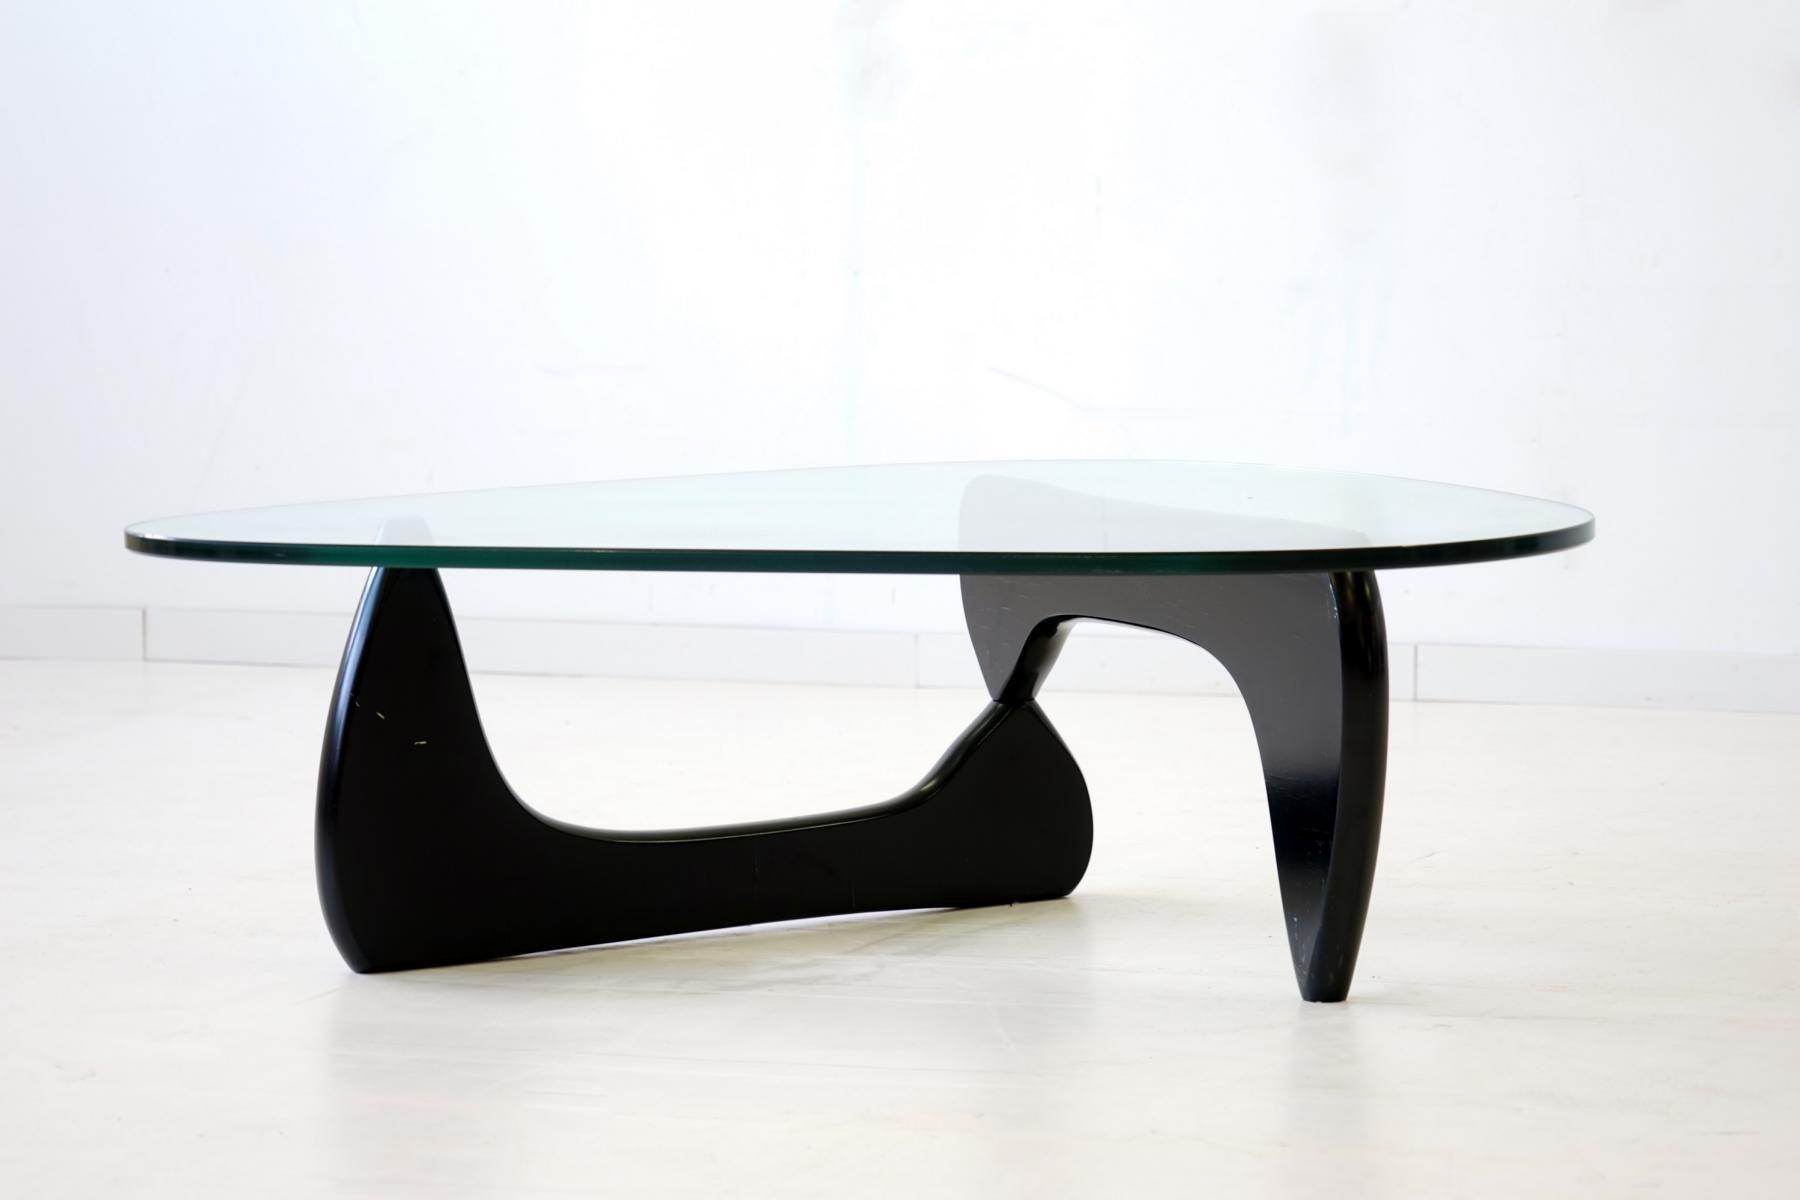 Glass Coffee Table By Isamu Noguchi For Herman Miller 1960s 1 Jpg 1 800 1 200 Pixels Noguchi Coffee Table Isamu Noguchi Noguchi [ 1200 x 1800 Pixel ]